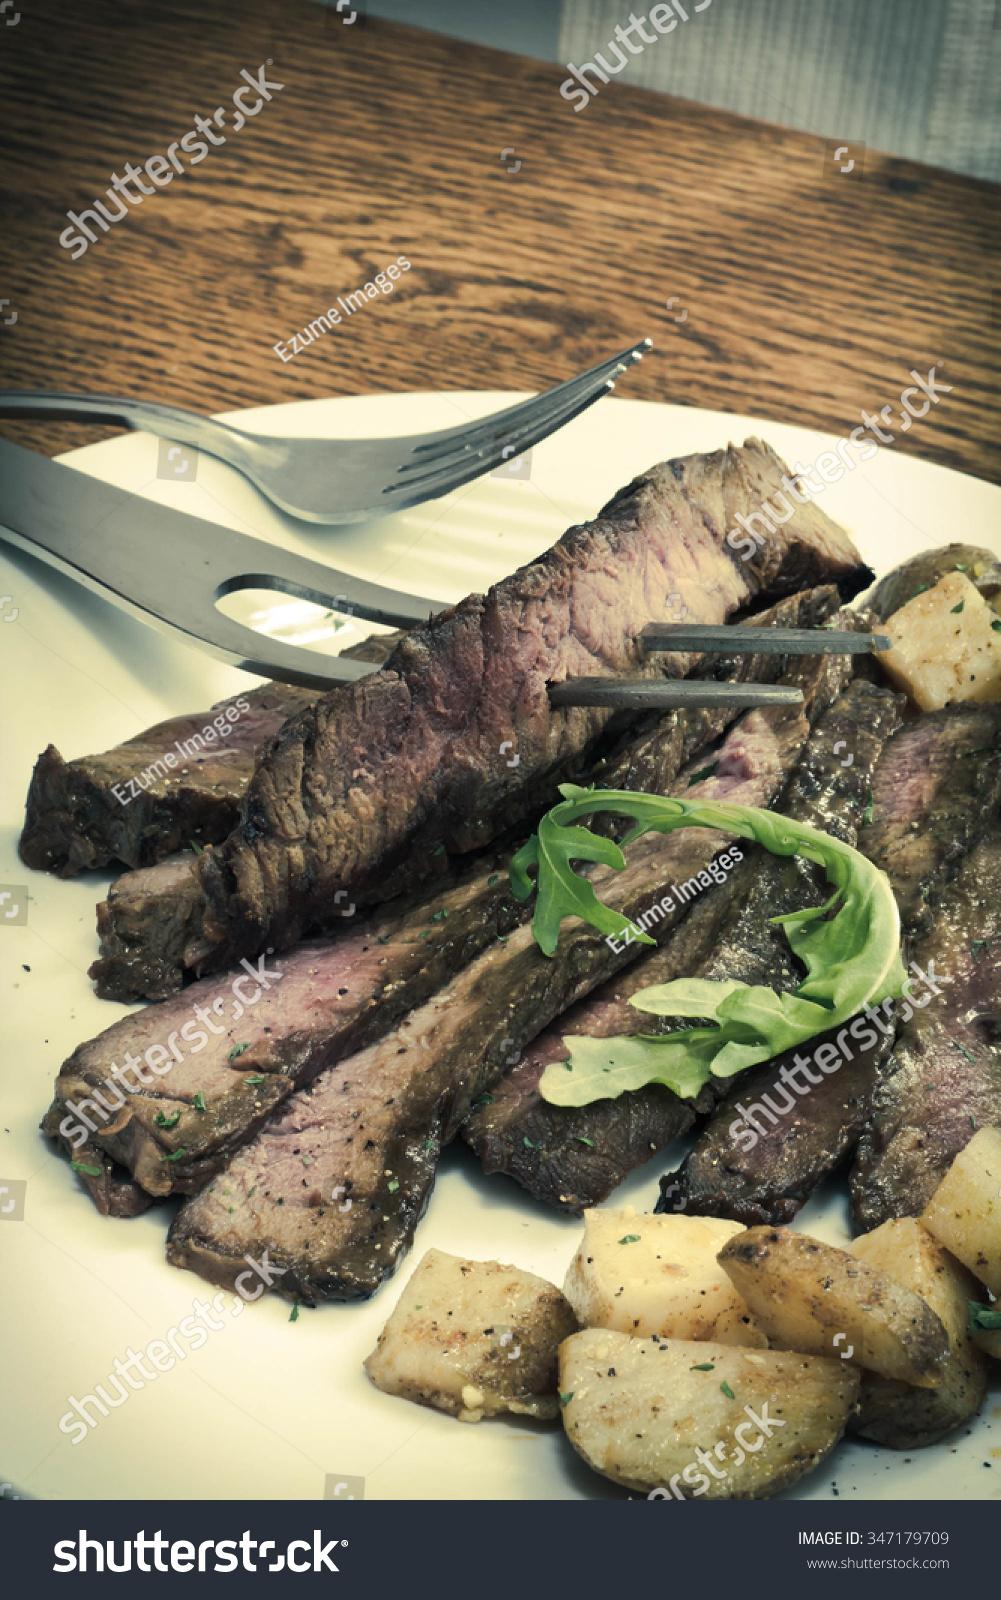 Sliced Juicy Skirt Steak With Potatoes And Arugula Garnish Stock Photo ...